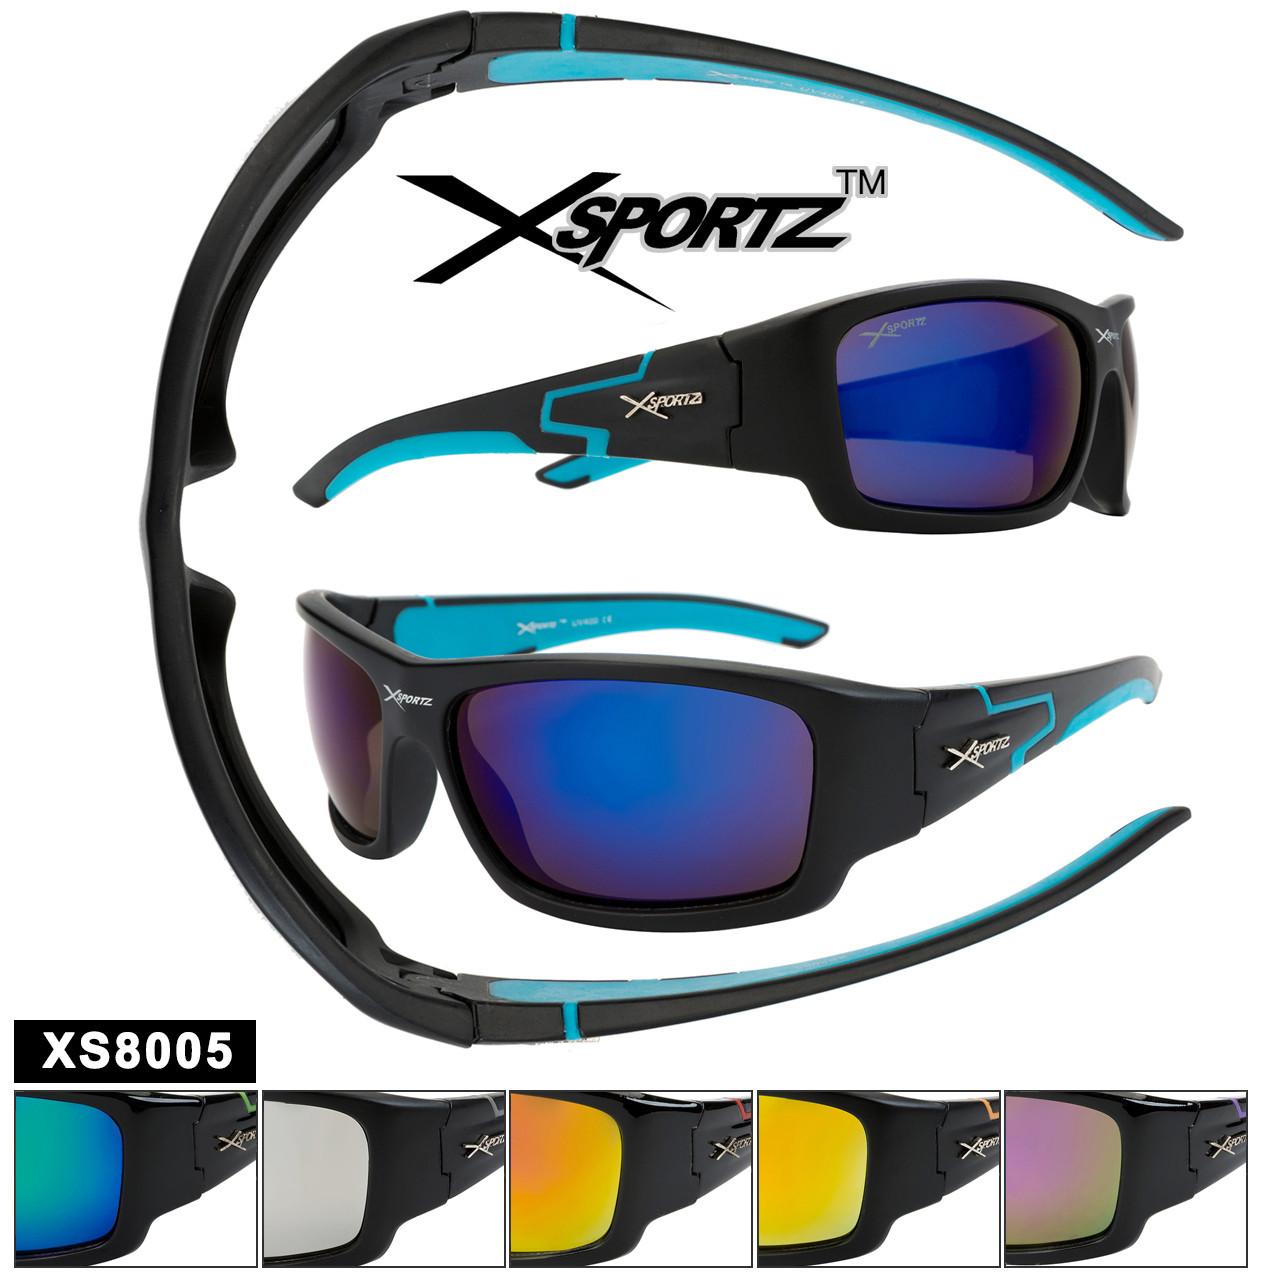 Xsportz™ Sports Sunglasses by the Dozen - Style XS8005